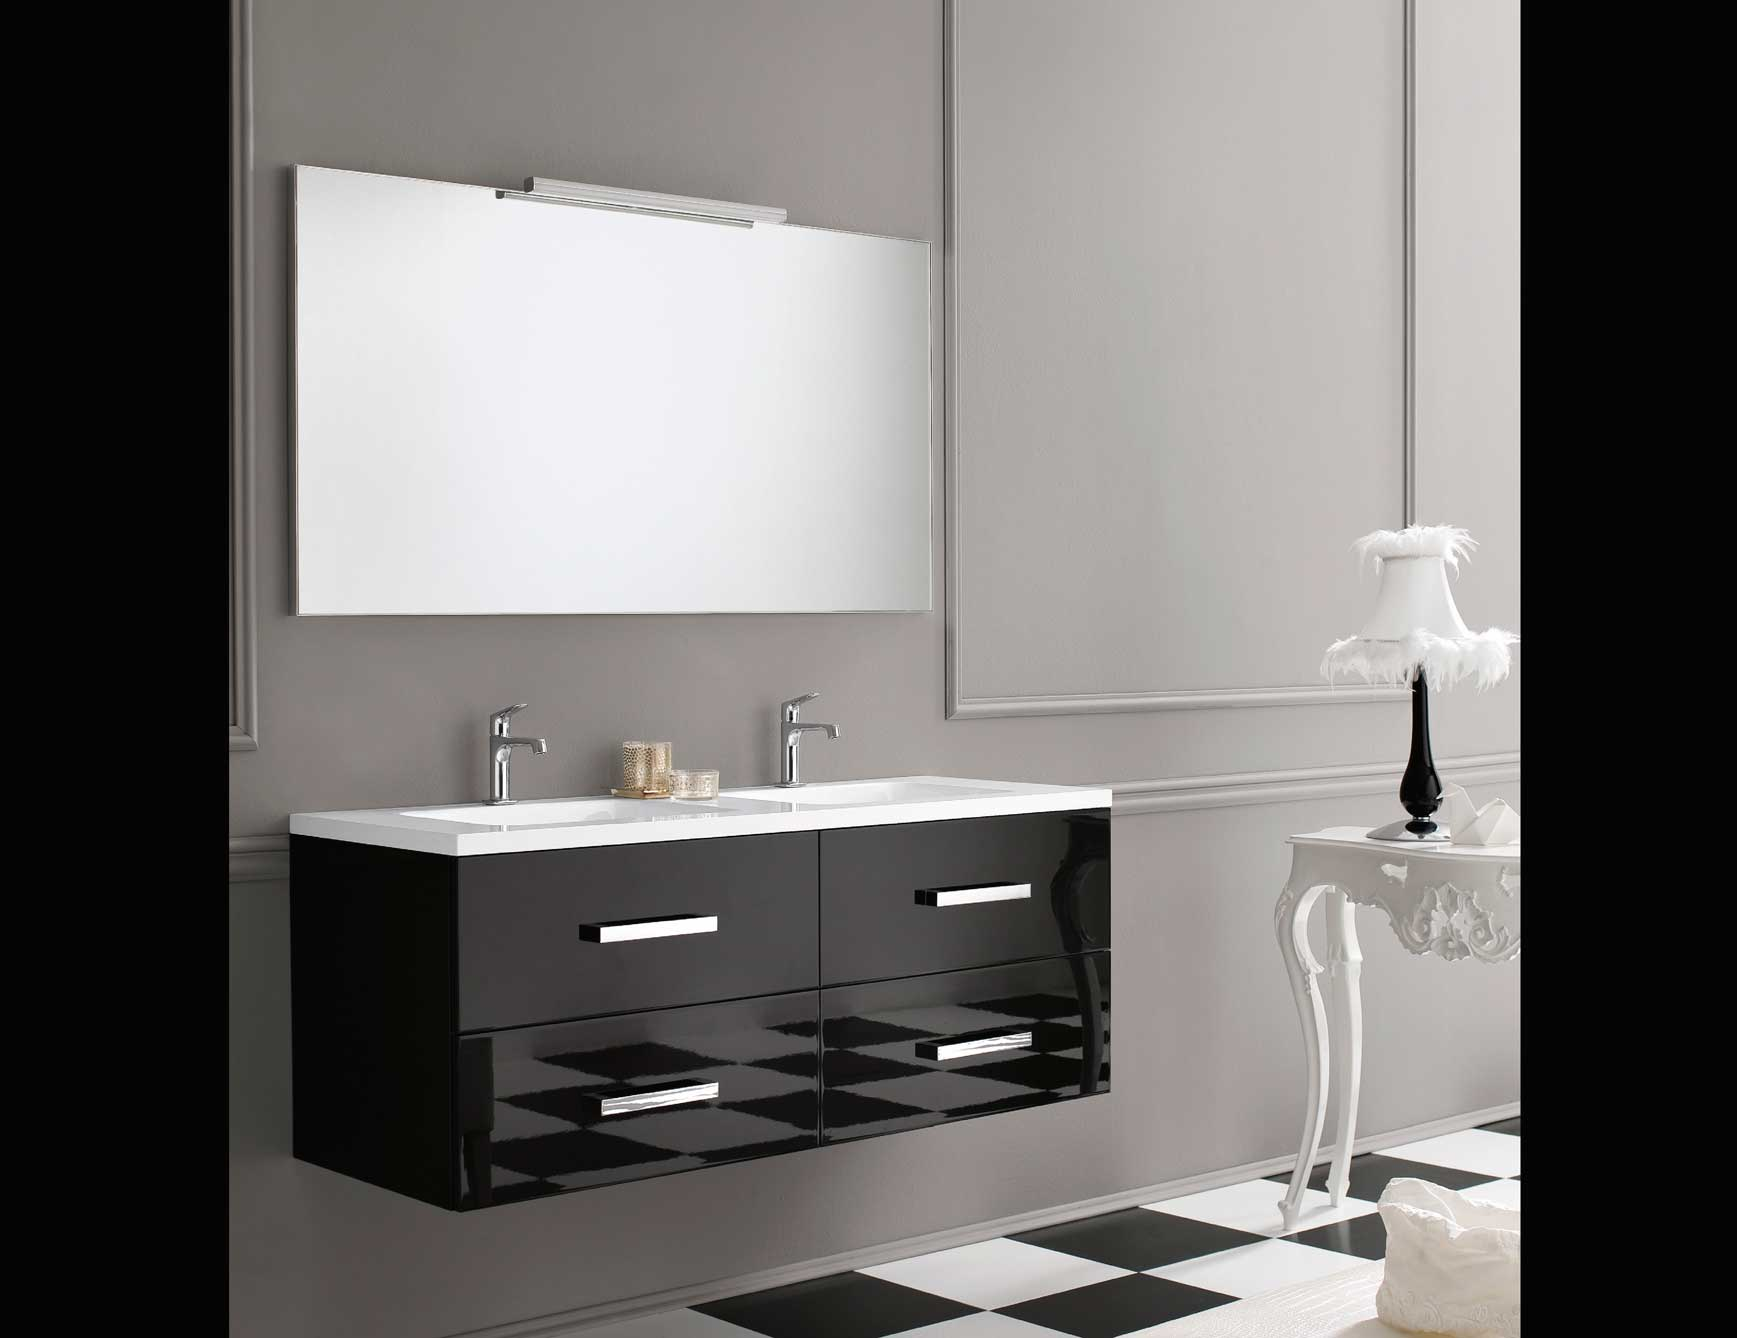 25 Amazing Italian Bathroom Tile Designs Ideas And Pictures